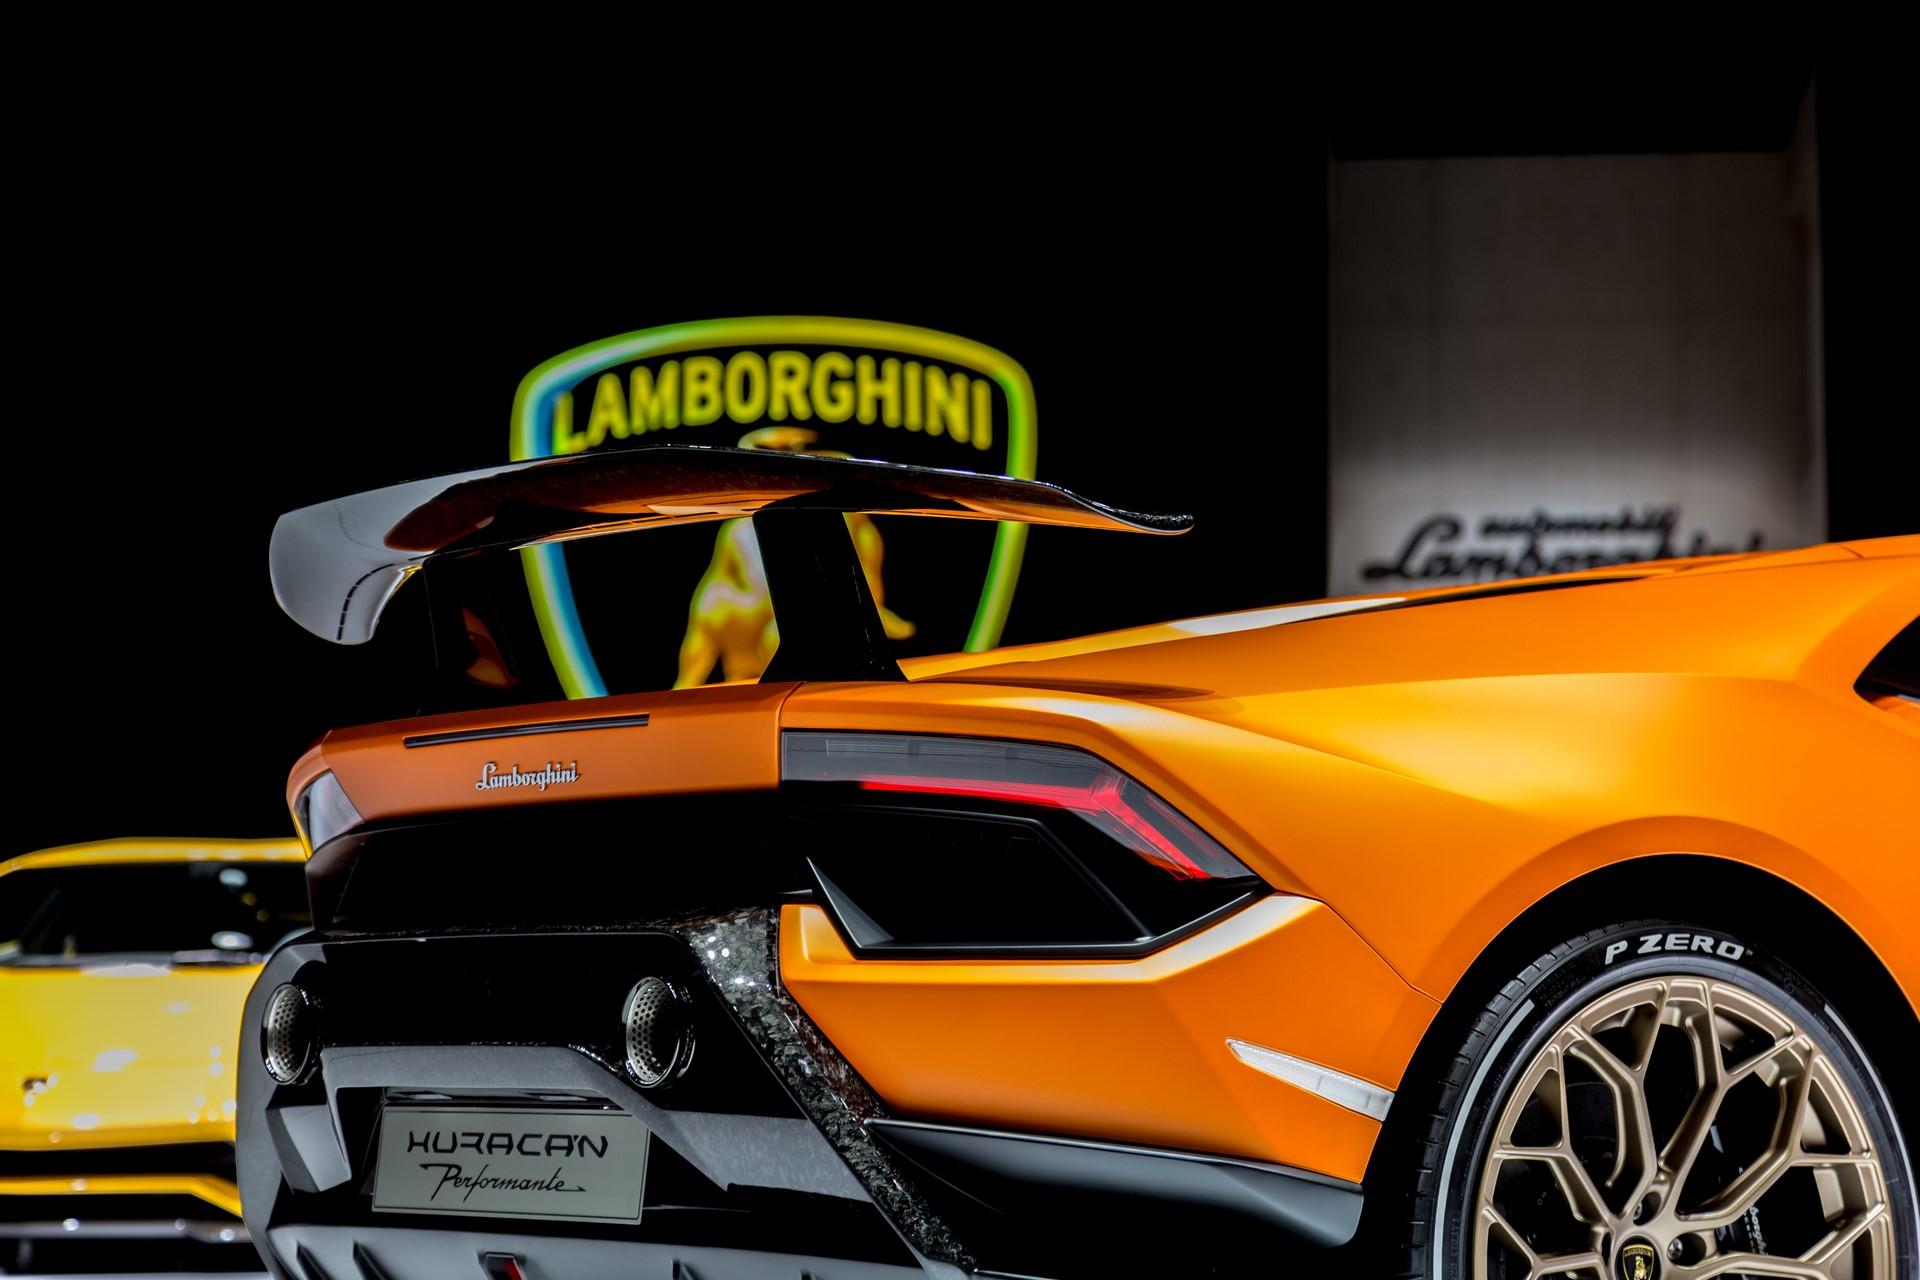 Lamborghini Huracan Performante Geneva 2017 (3)